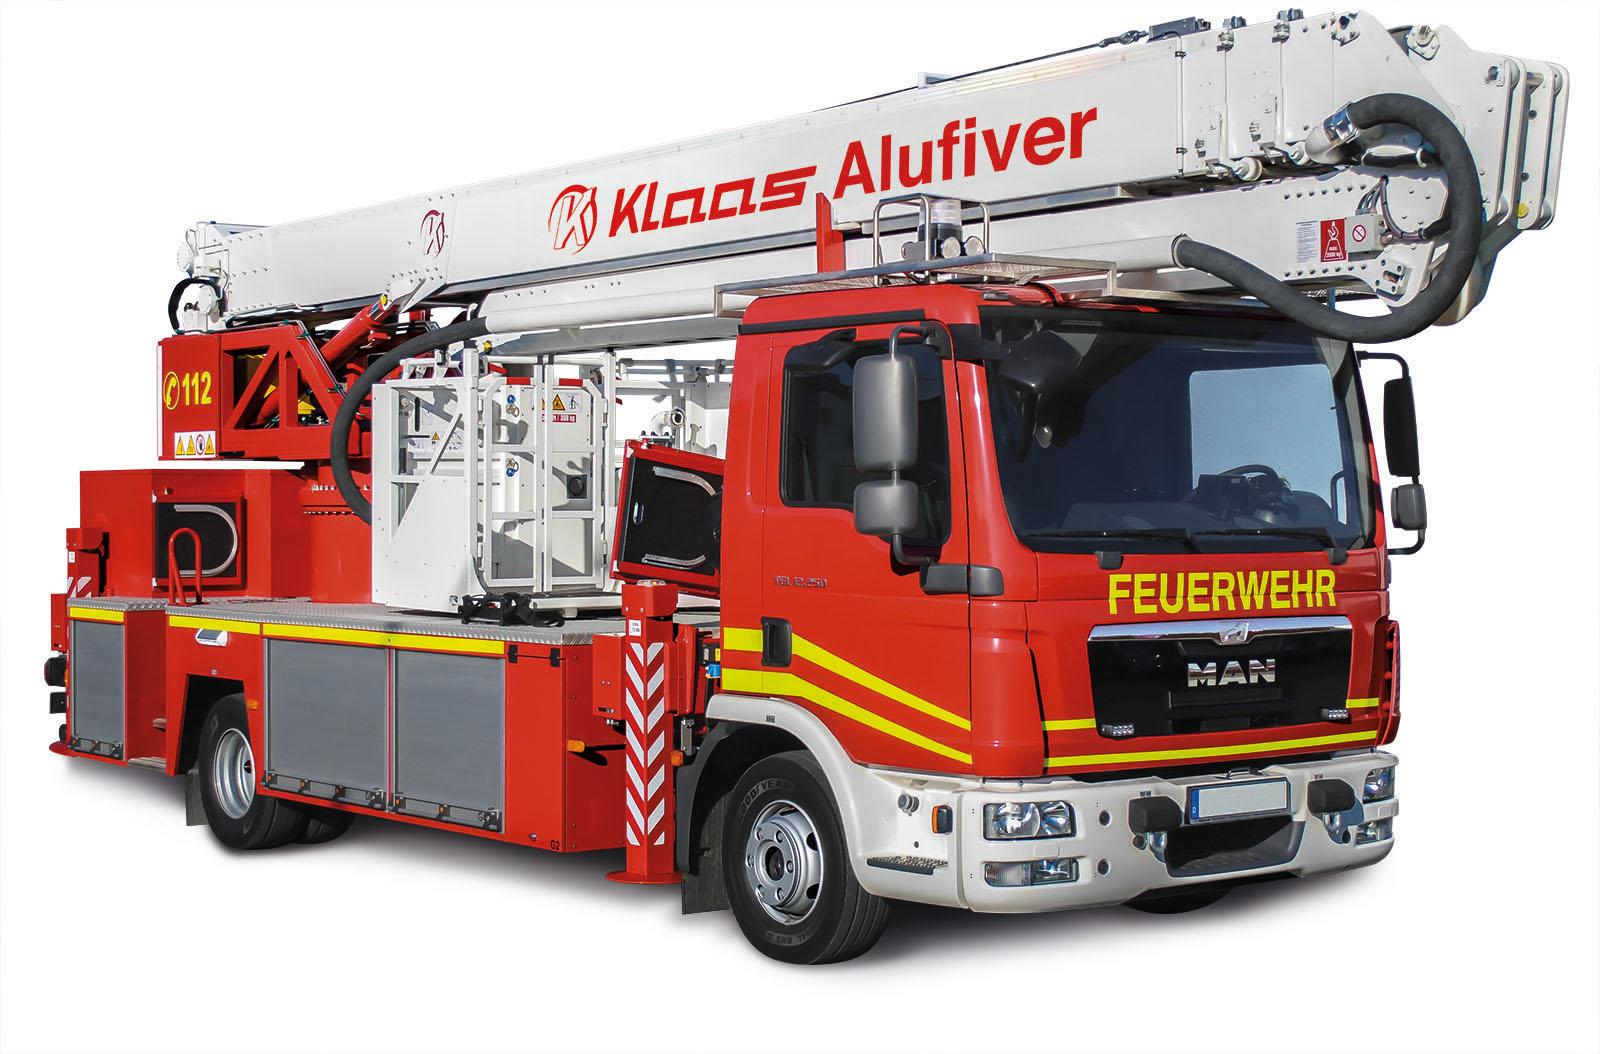 AluFiver TM 32